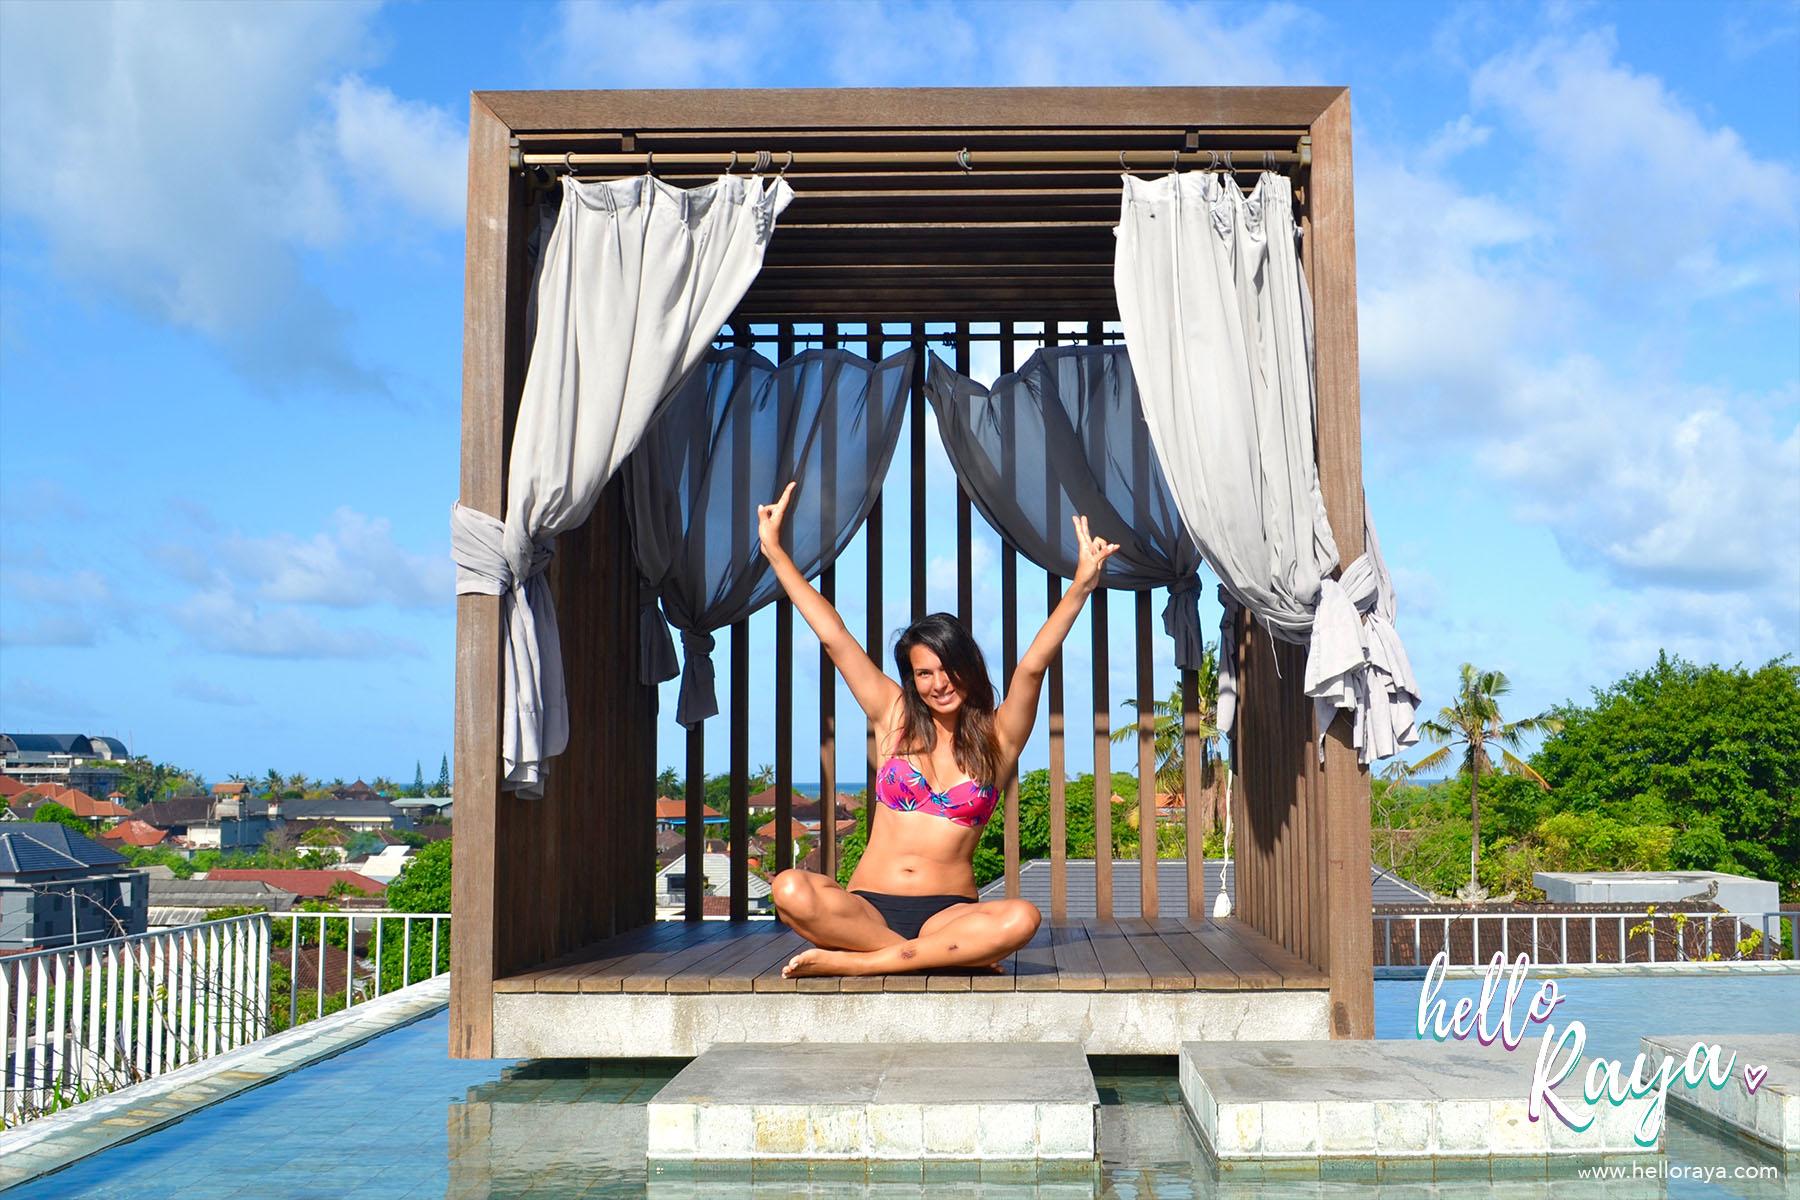 Hotel in Review: The Watermark Hotel & Spa in Jimbaran, Bali